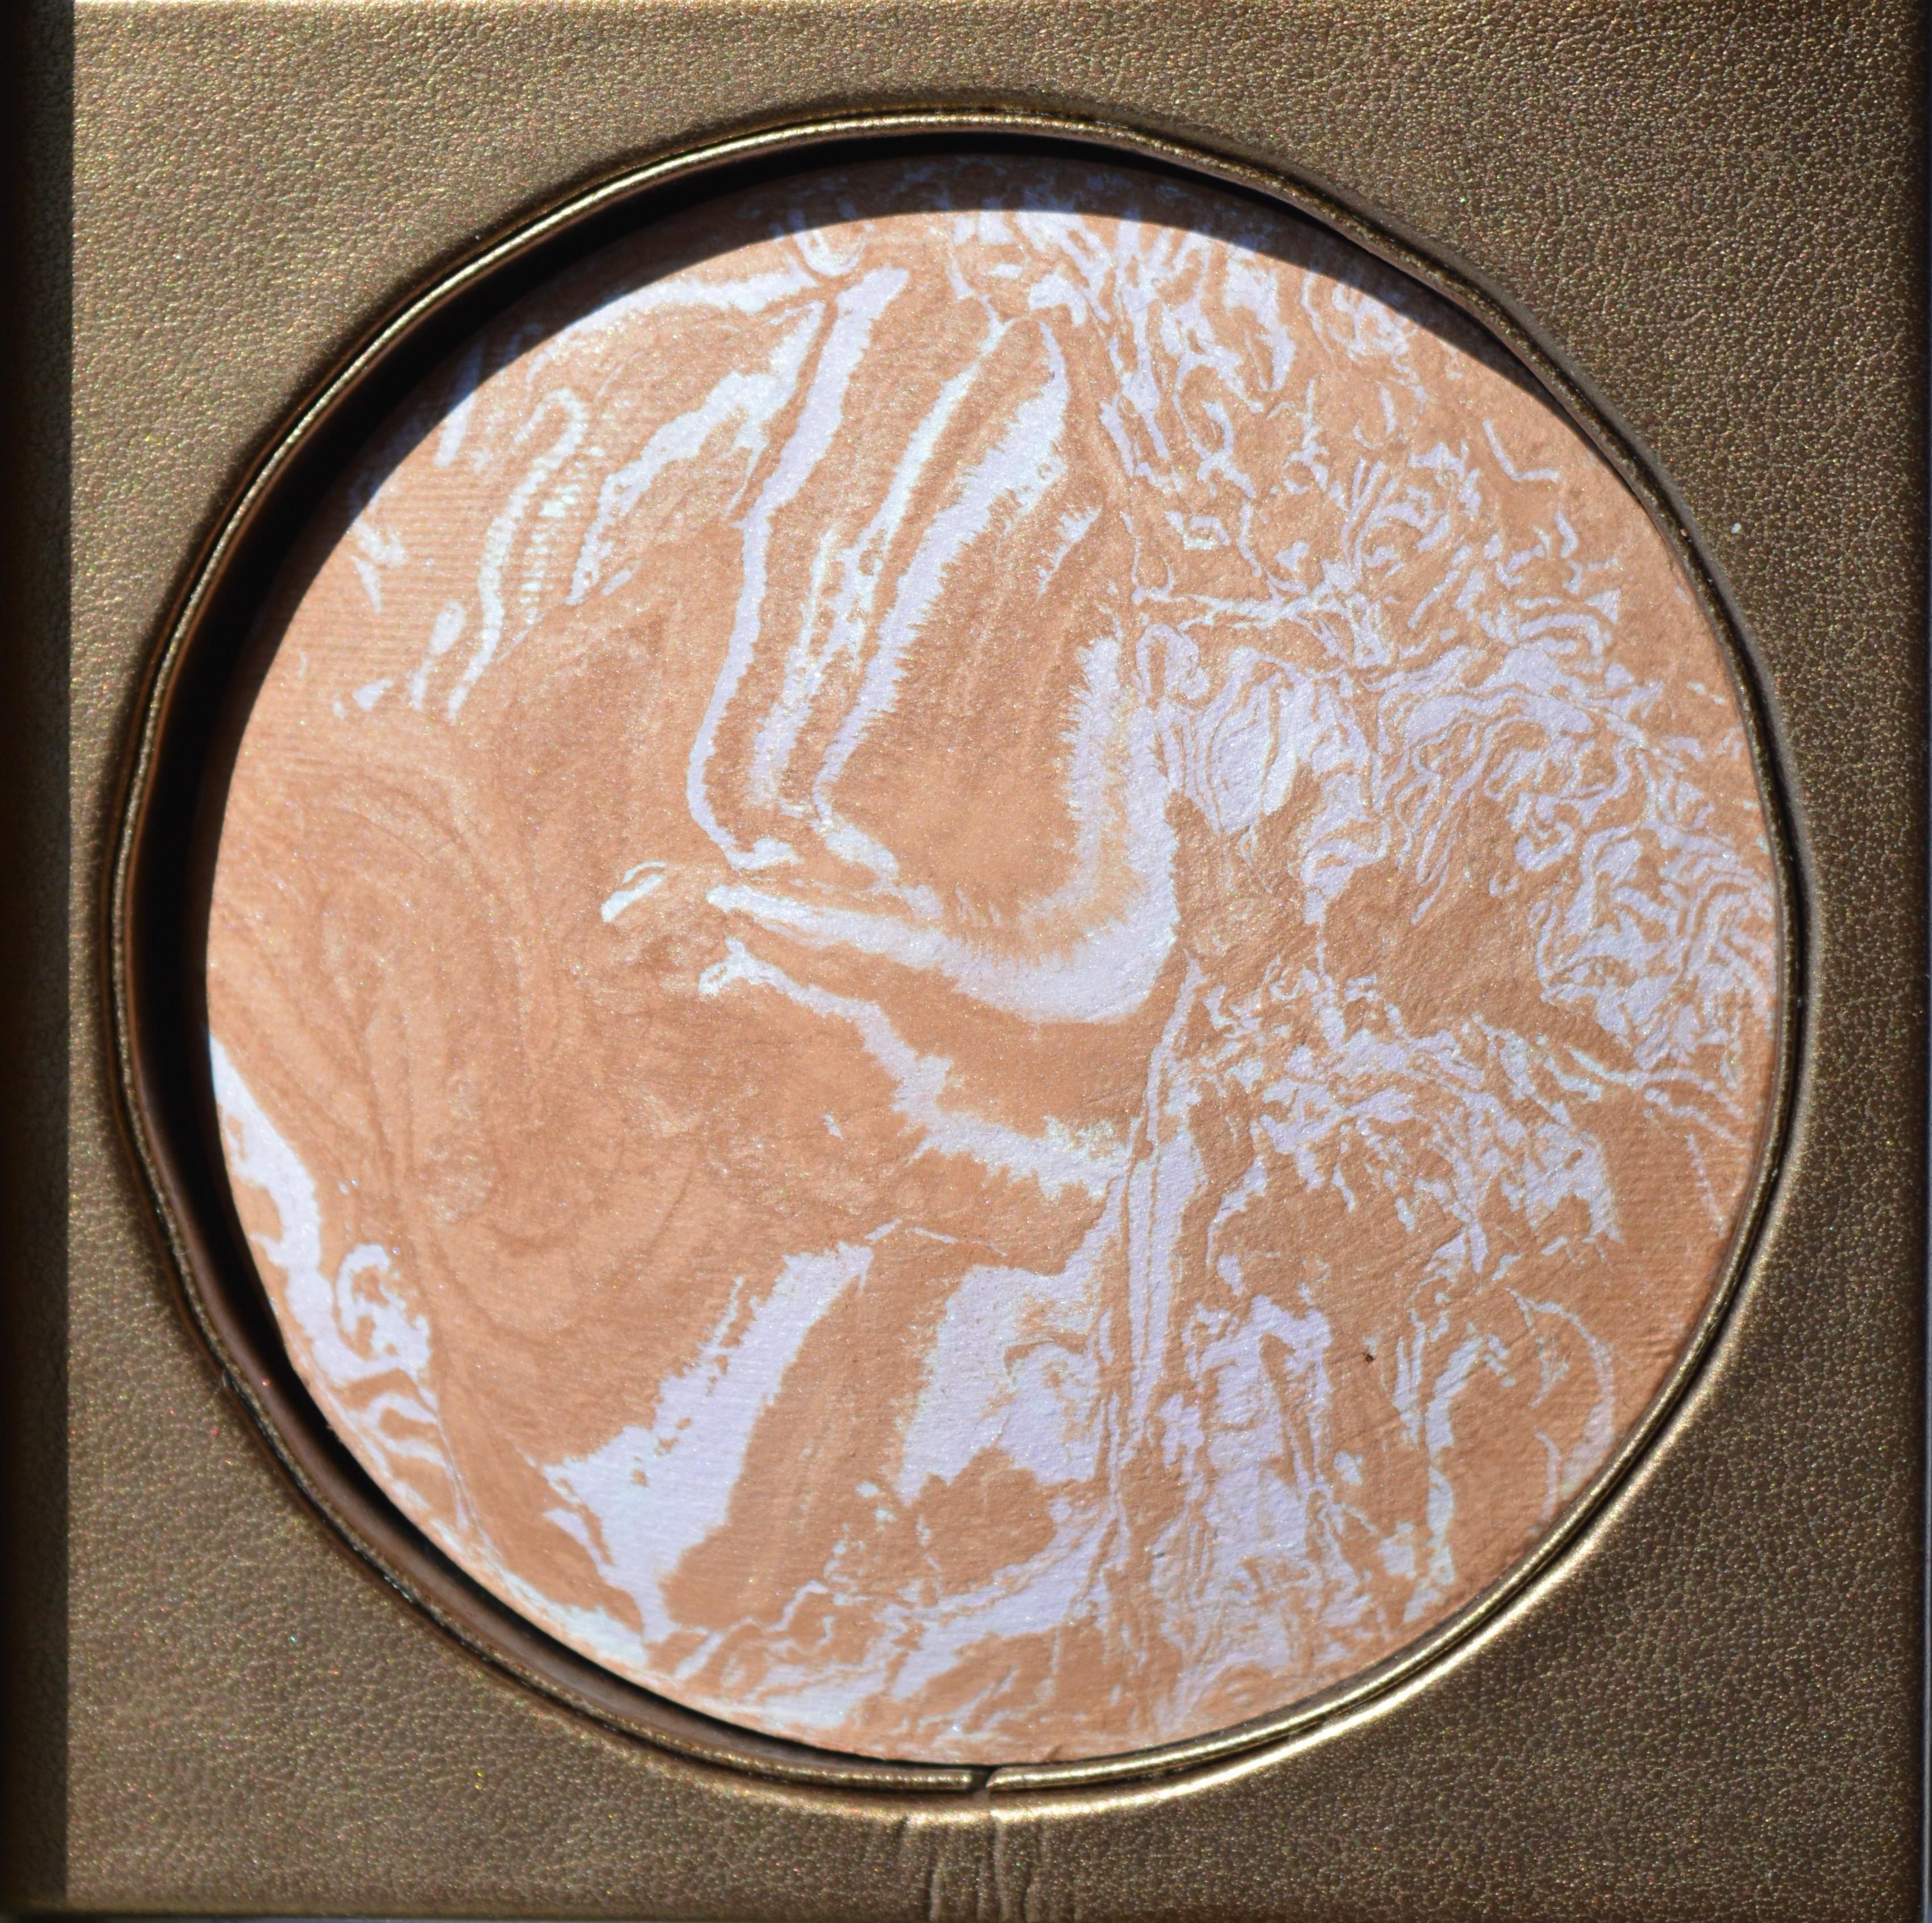 TARTE-Amazonian clay matte waterproof bronzer